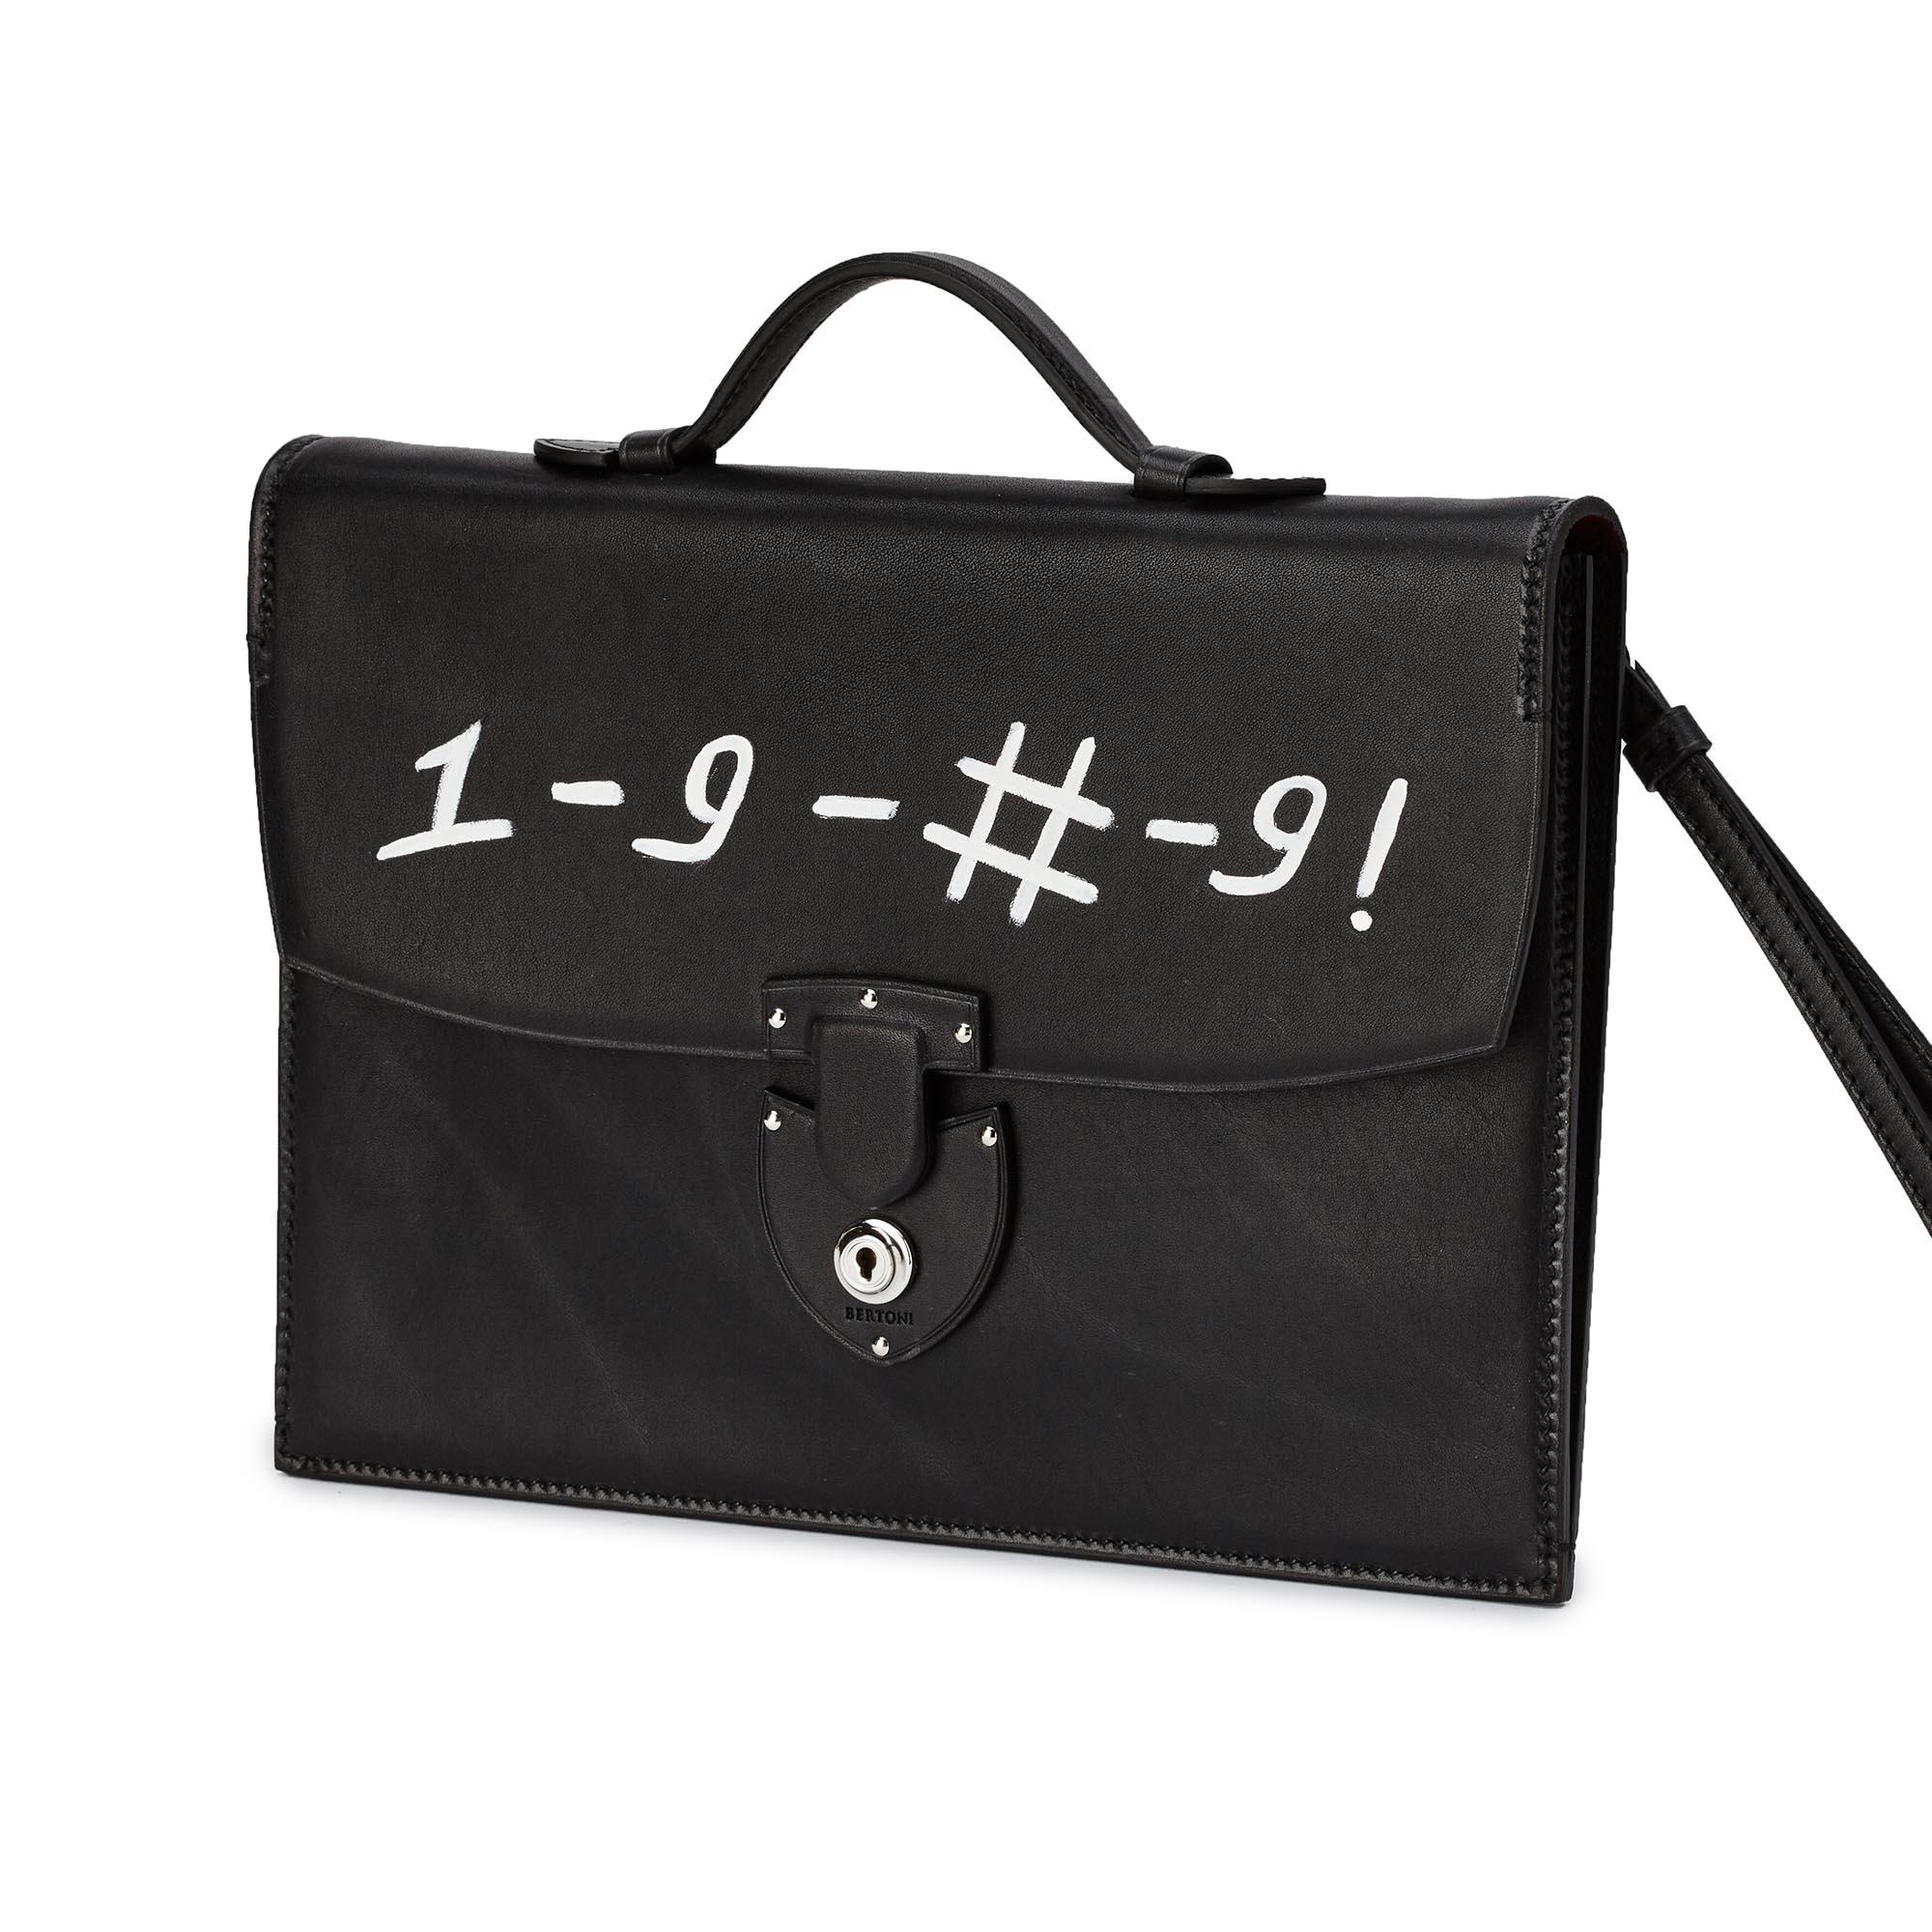 Signature-Biker-black-rock-calf-bag-Bertoni-1949_01